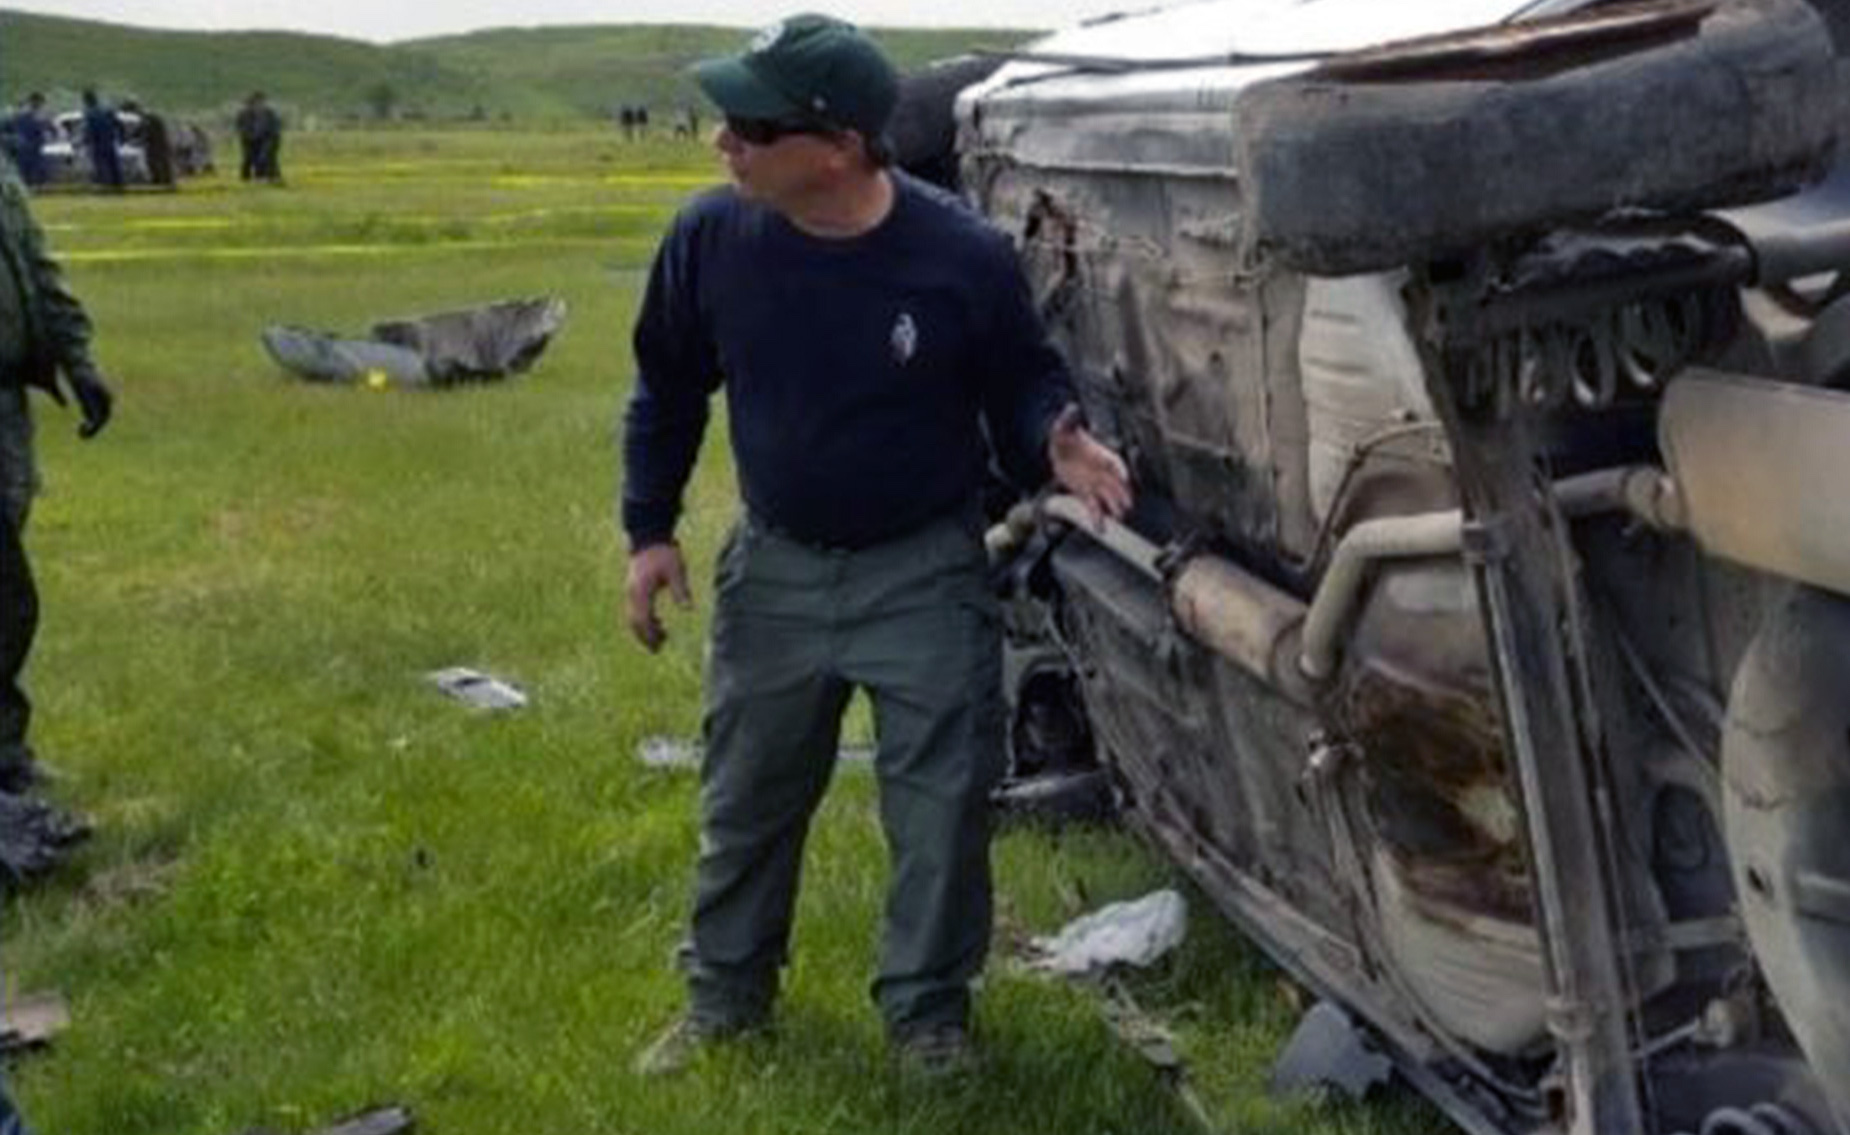 Uzbekistani law enforcement officers receive special training from FBI